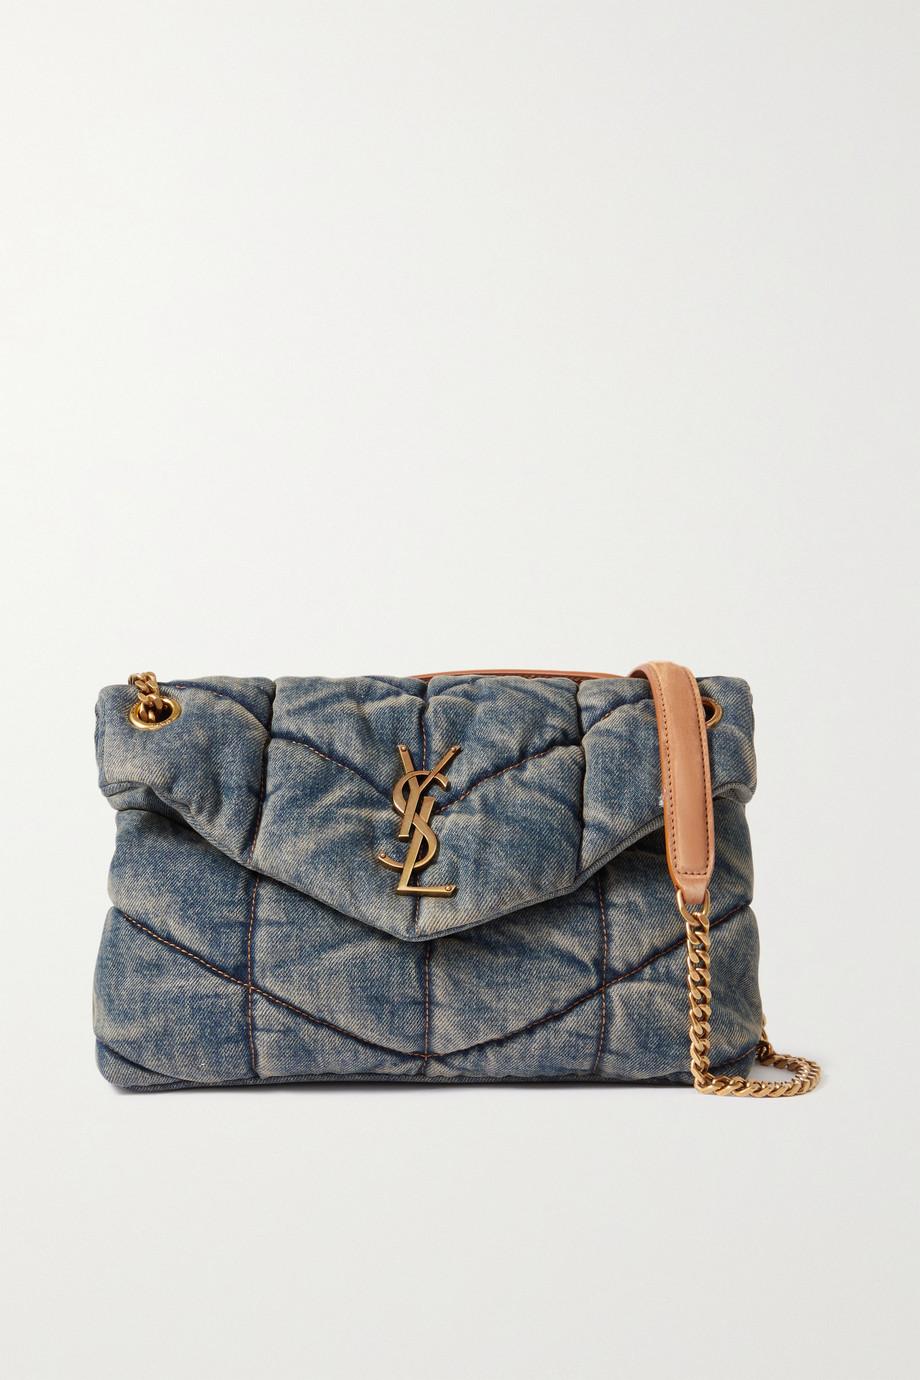 SAINT LAURENT Loulou Puffer small suede-trimmed quilted denim shoulder bag